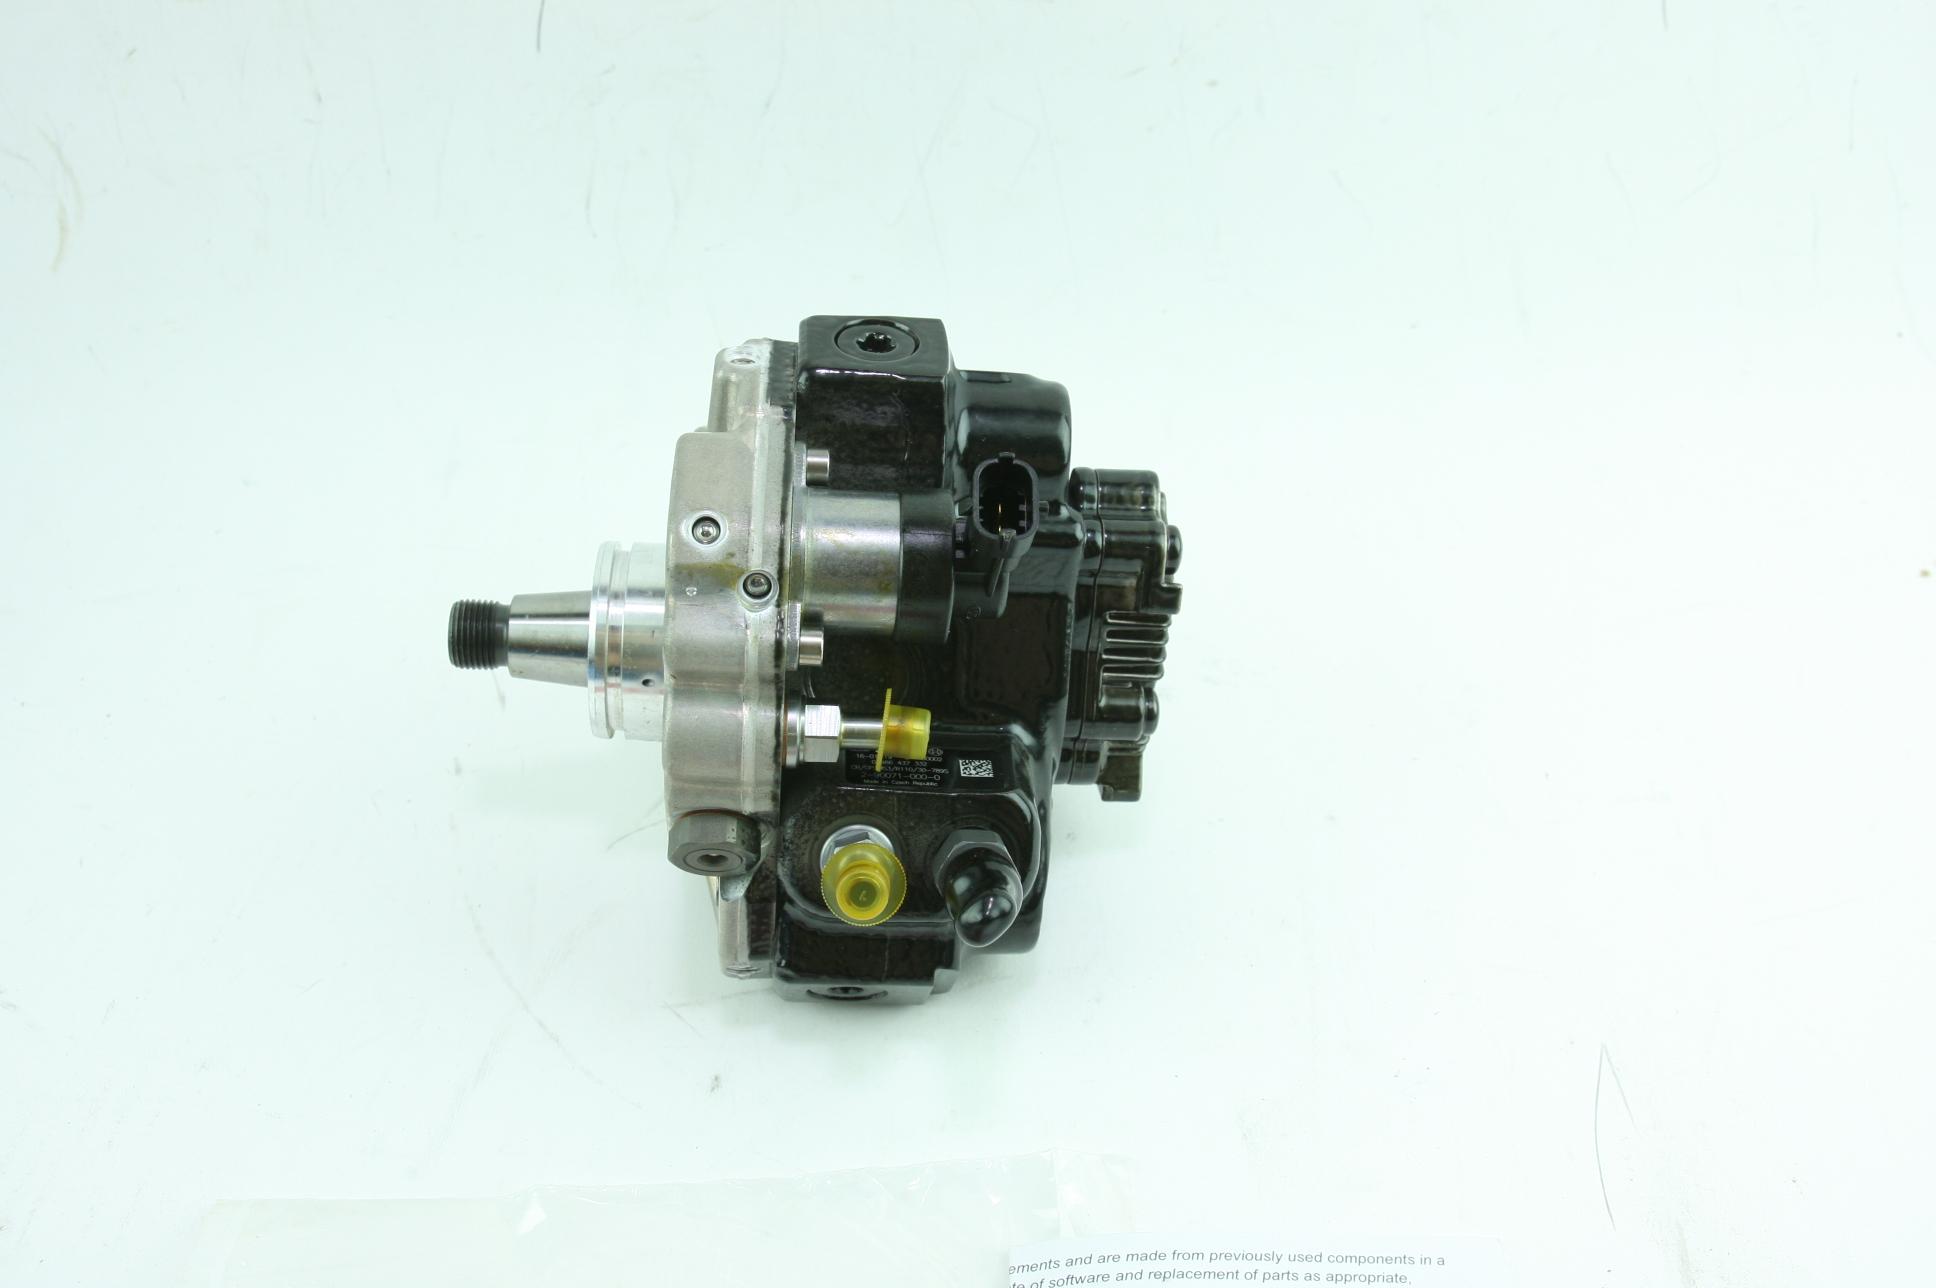 New Genuine OEM GM 97780161 Reman Injection Pump w/ Regulator 06-10 Duramax 6.6 - image 8